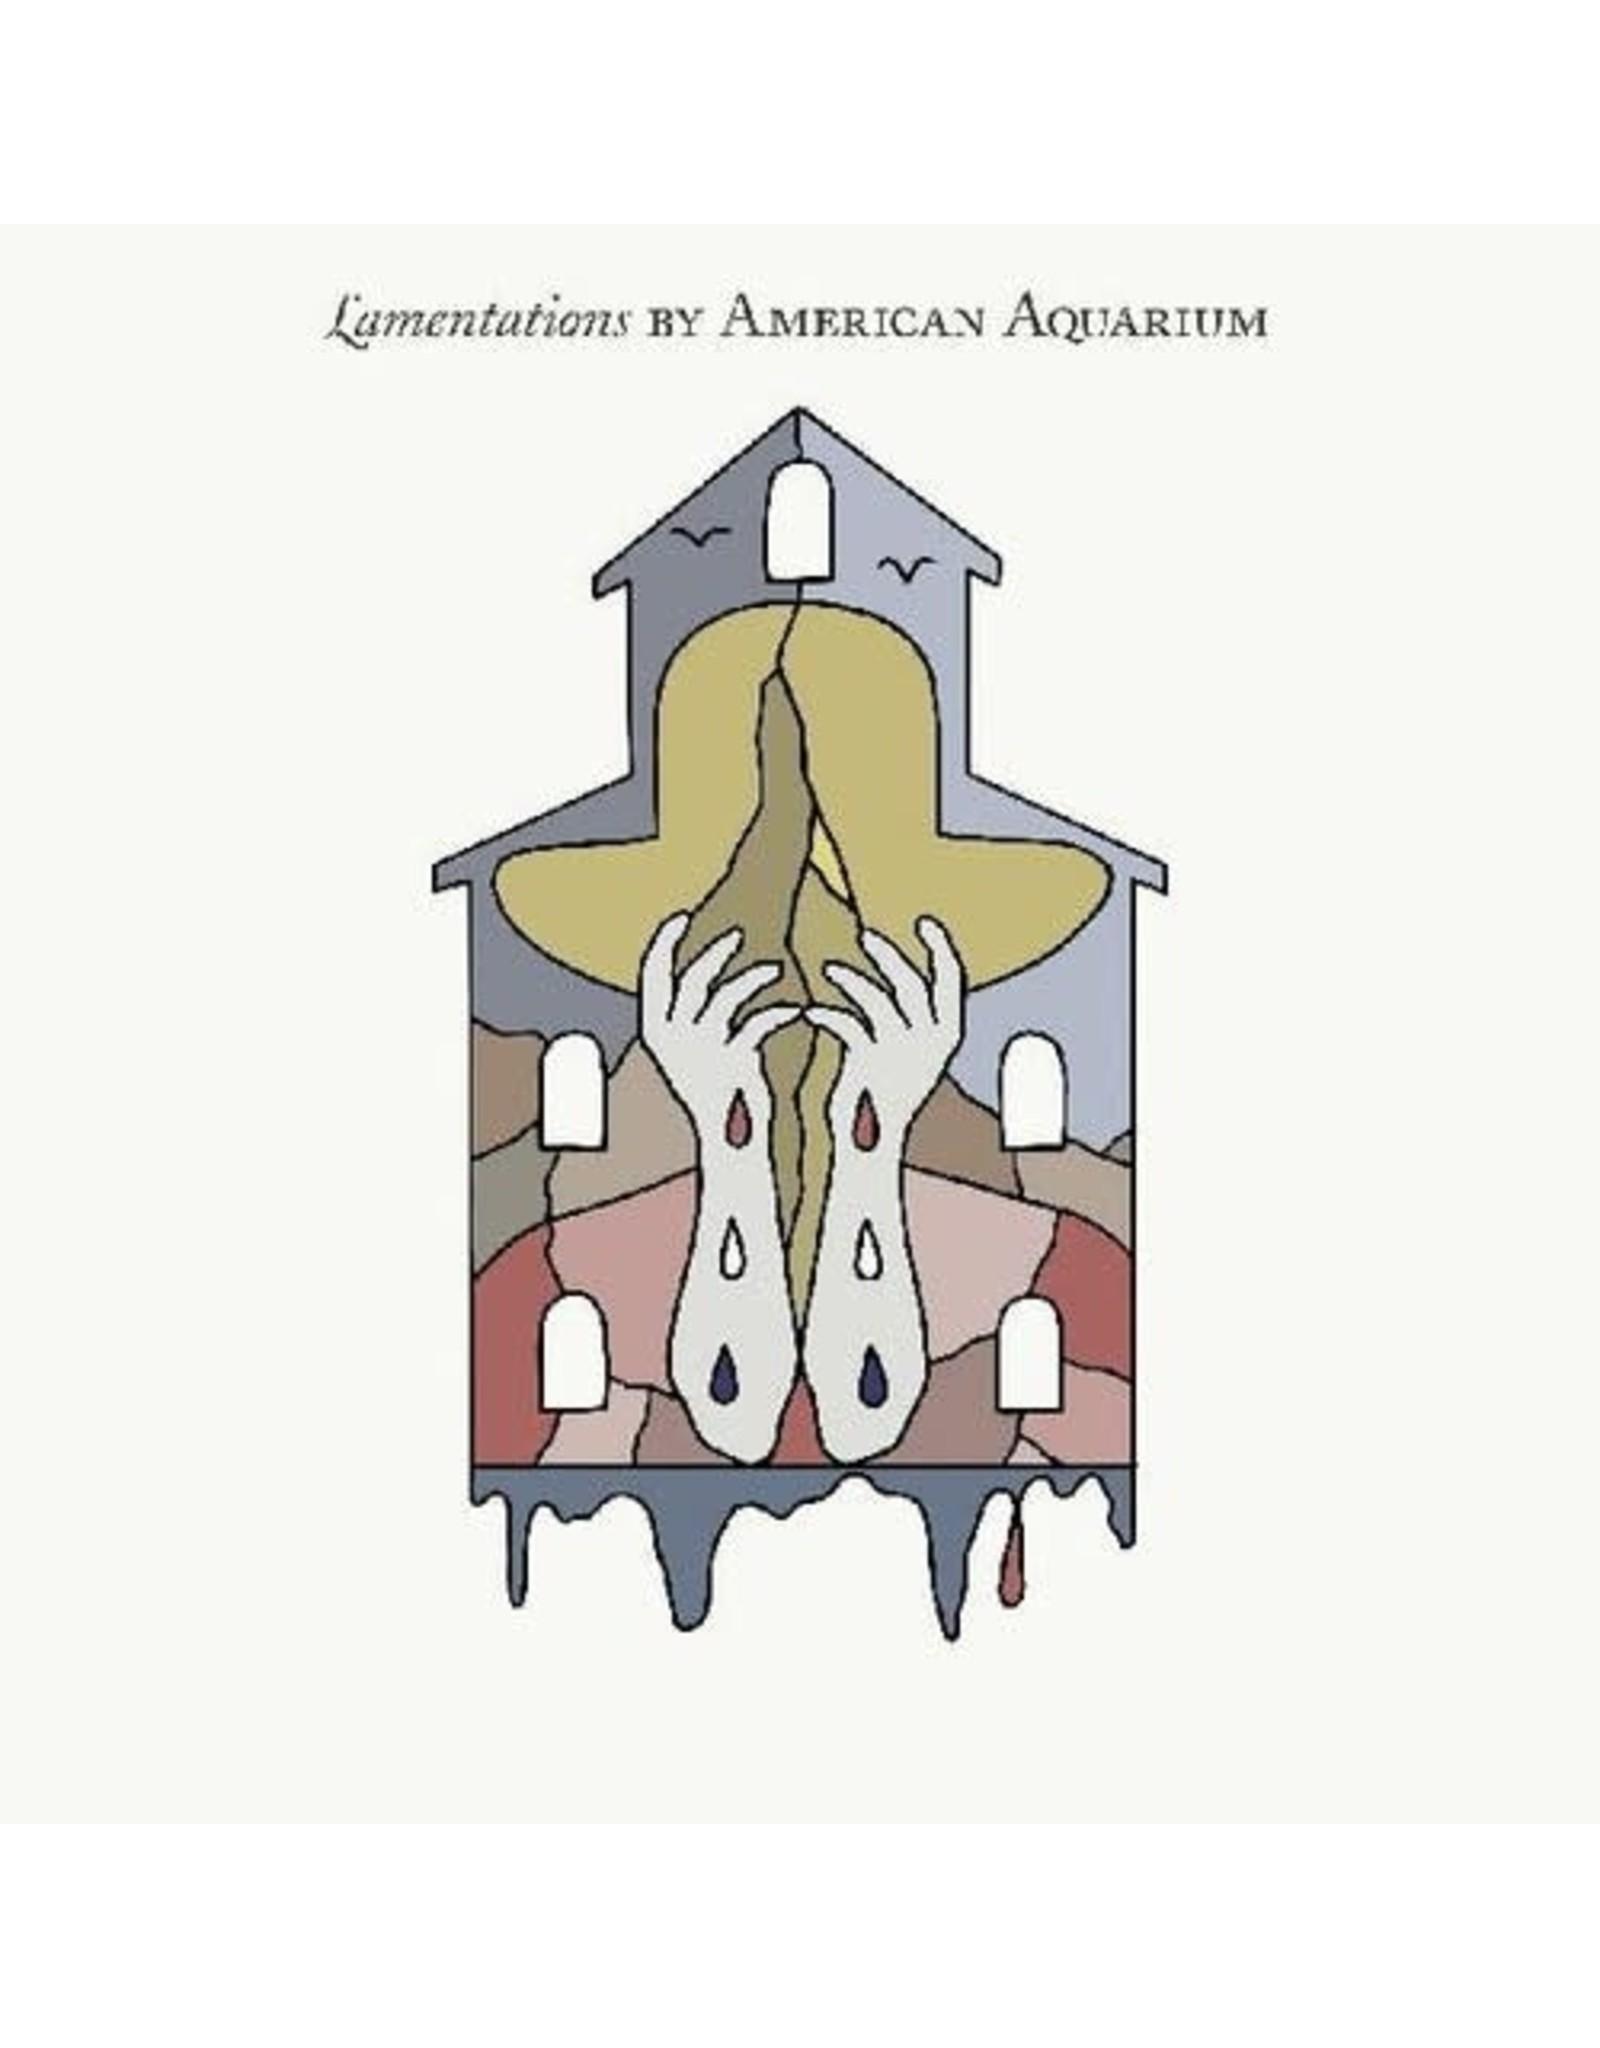 American Aquarium / Lamentations